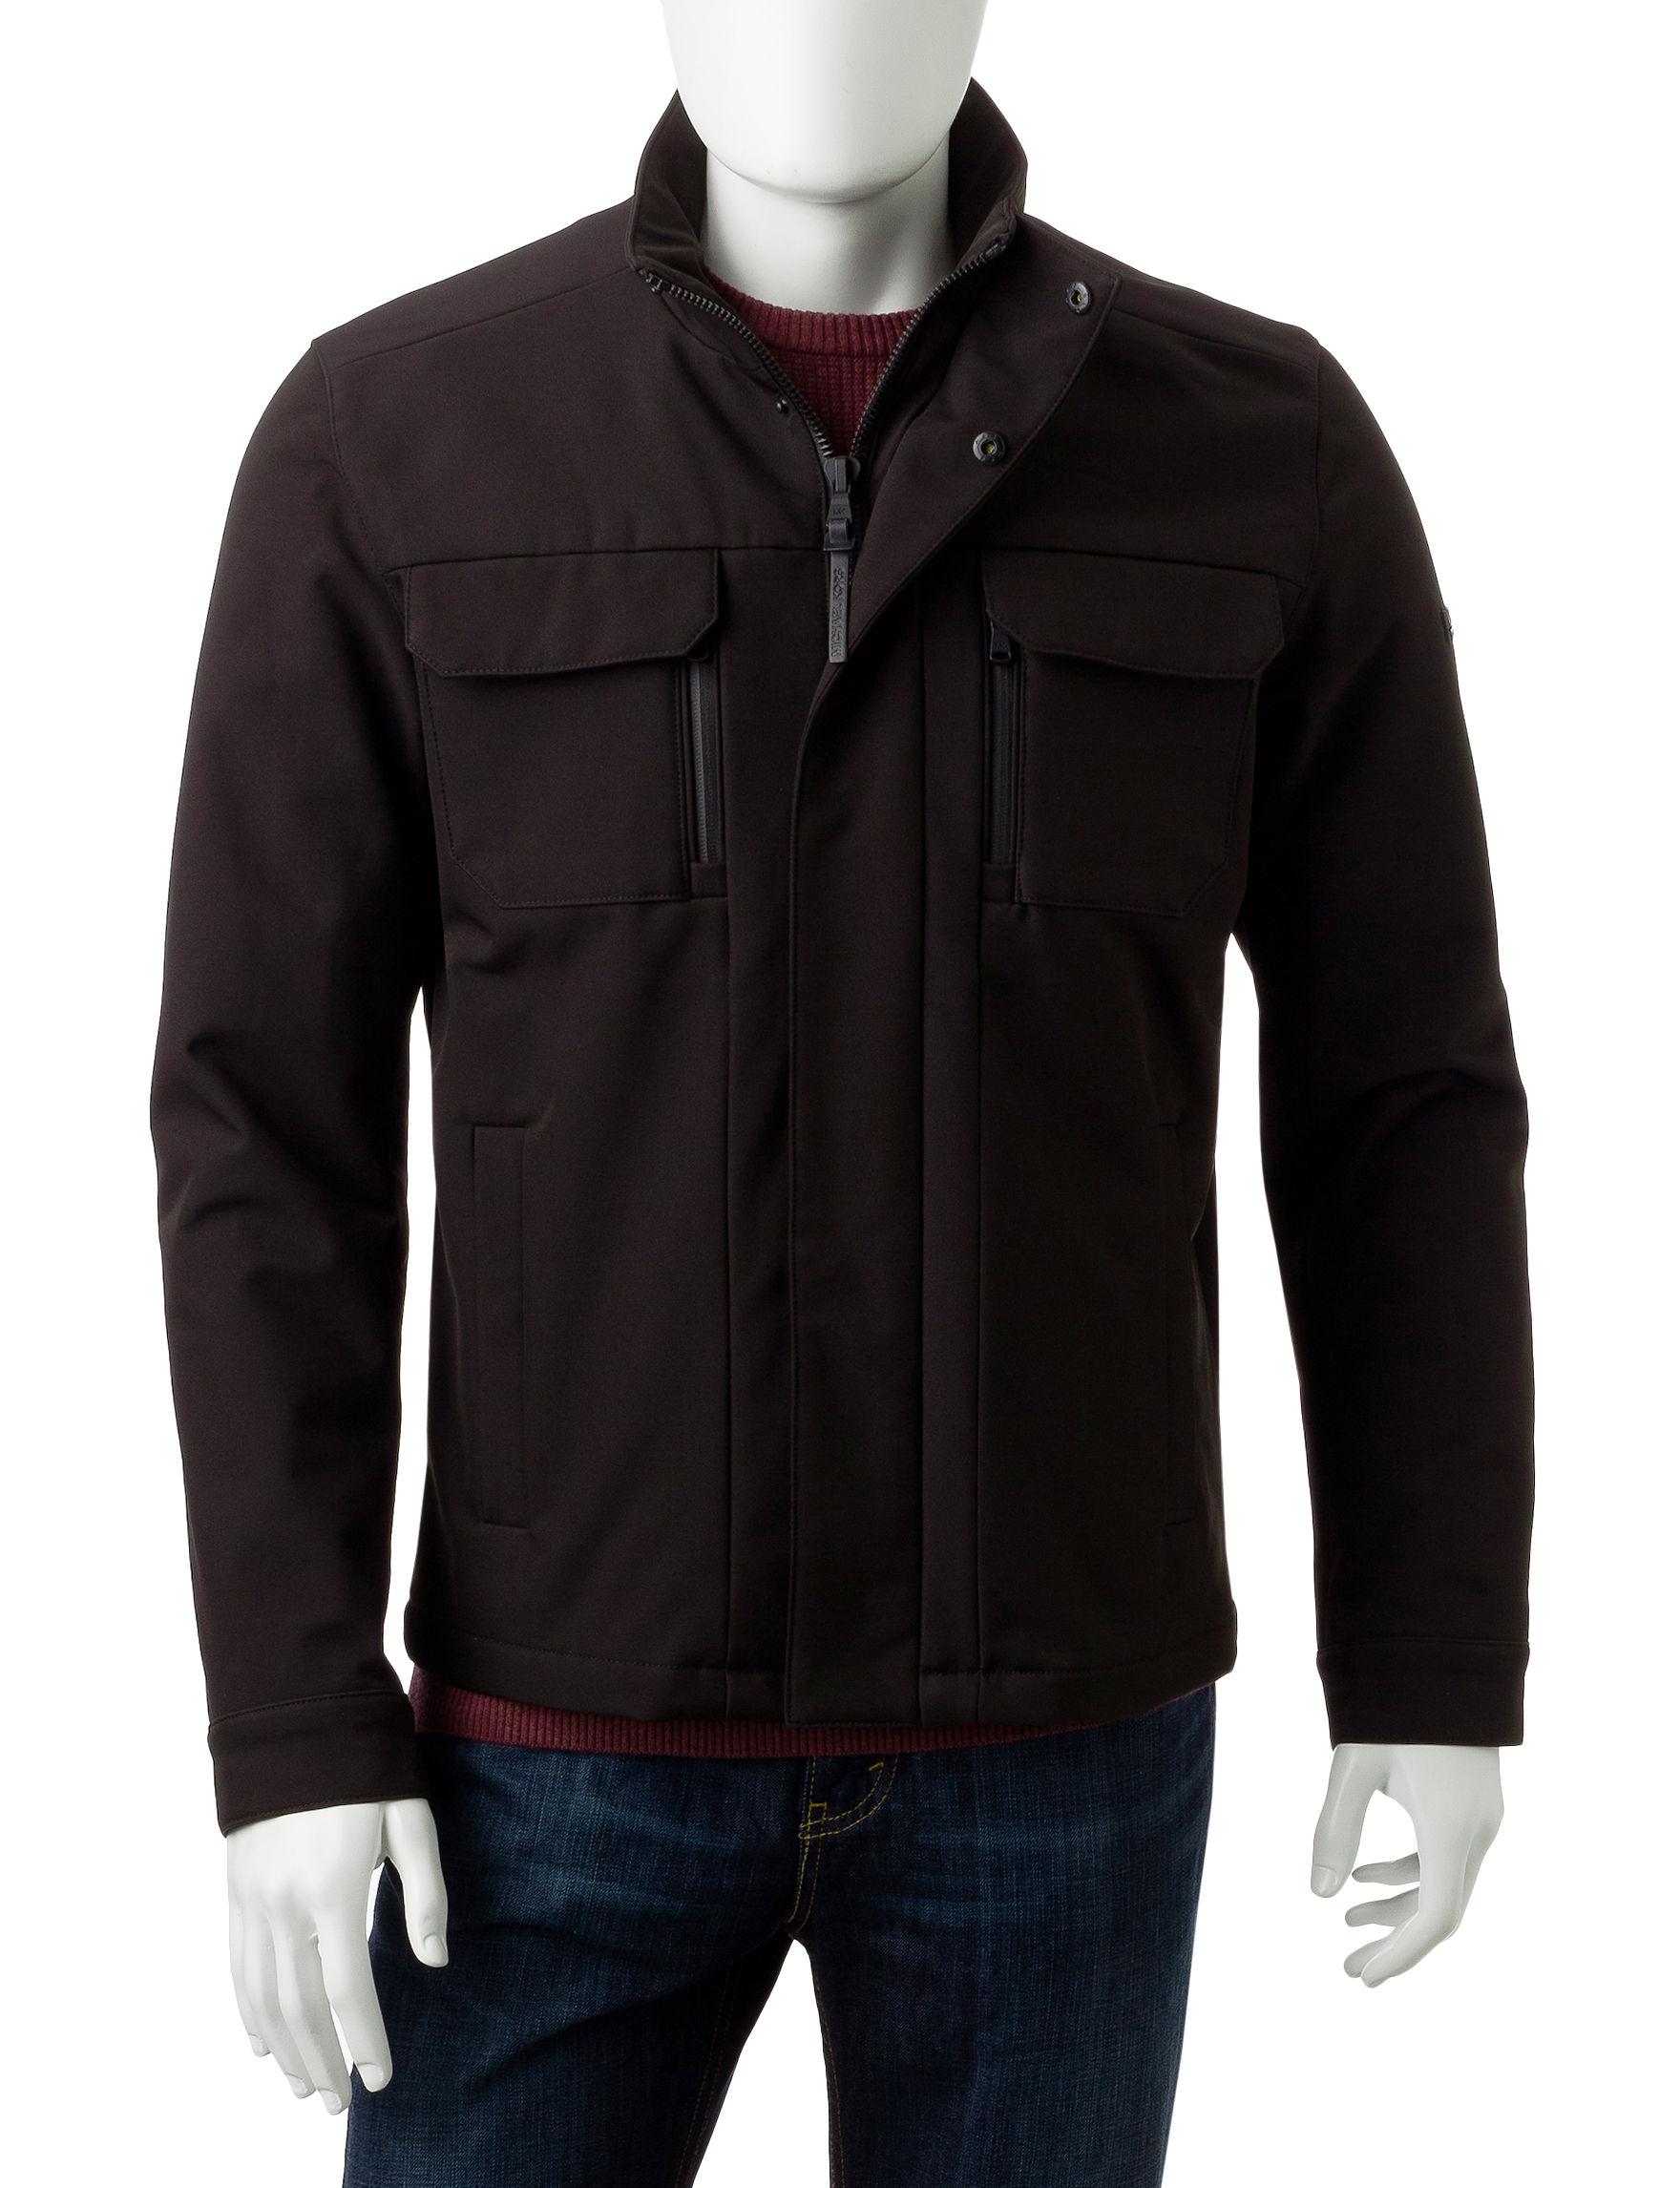 Michael Kors Black Fleece & Soft Shell Jackets